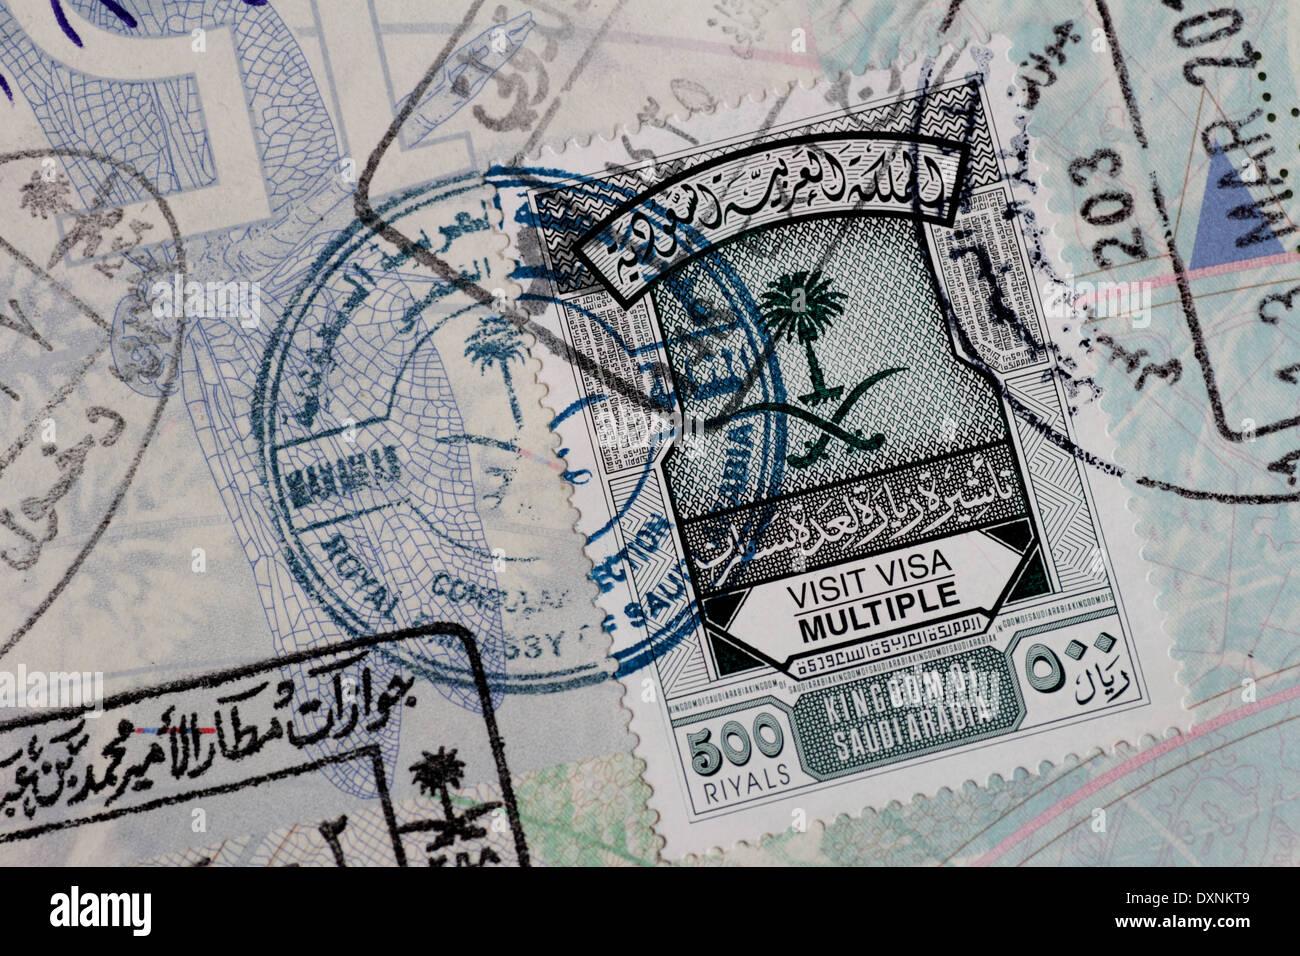 Saudi multiple entry visa stamp in British passport - Stock Image